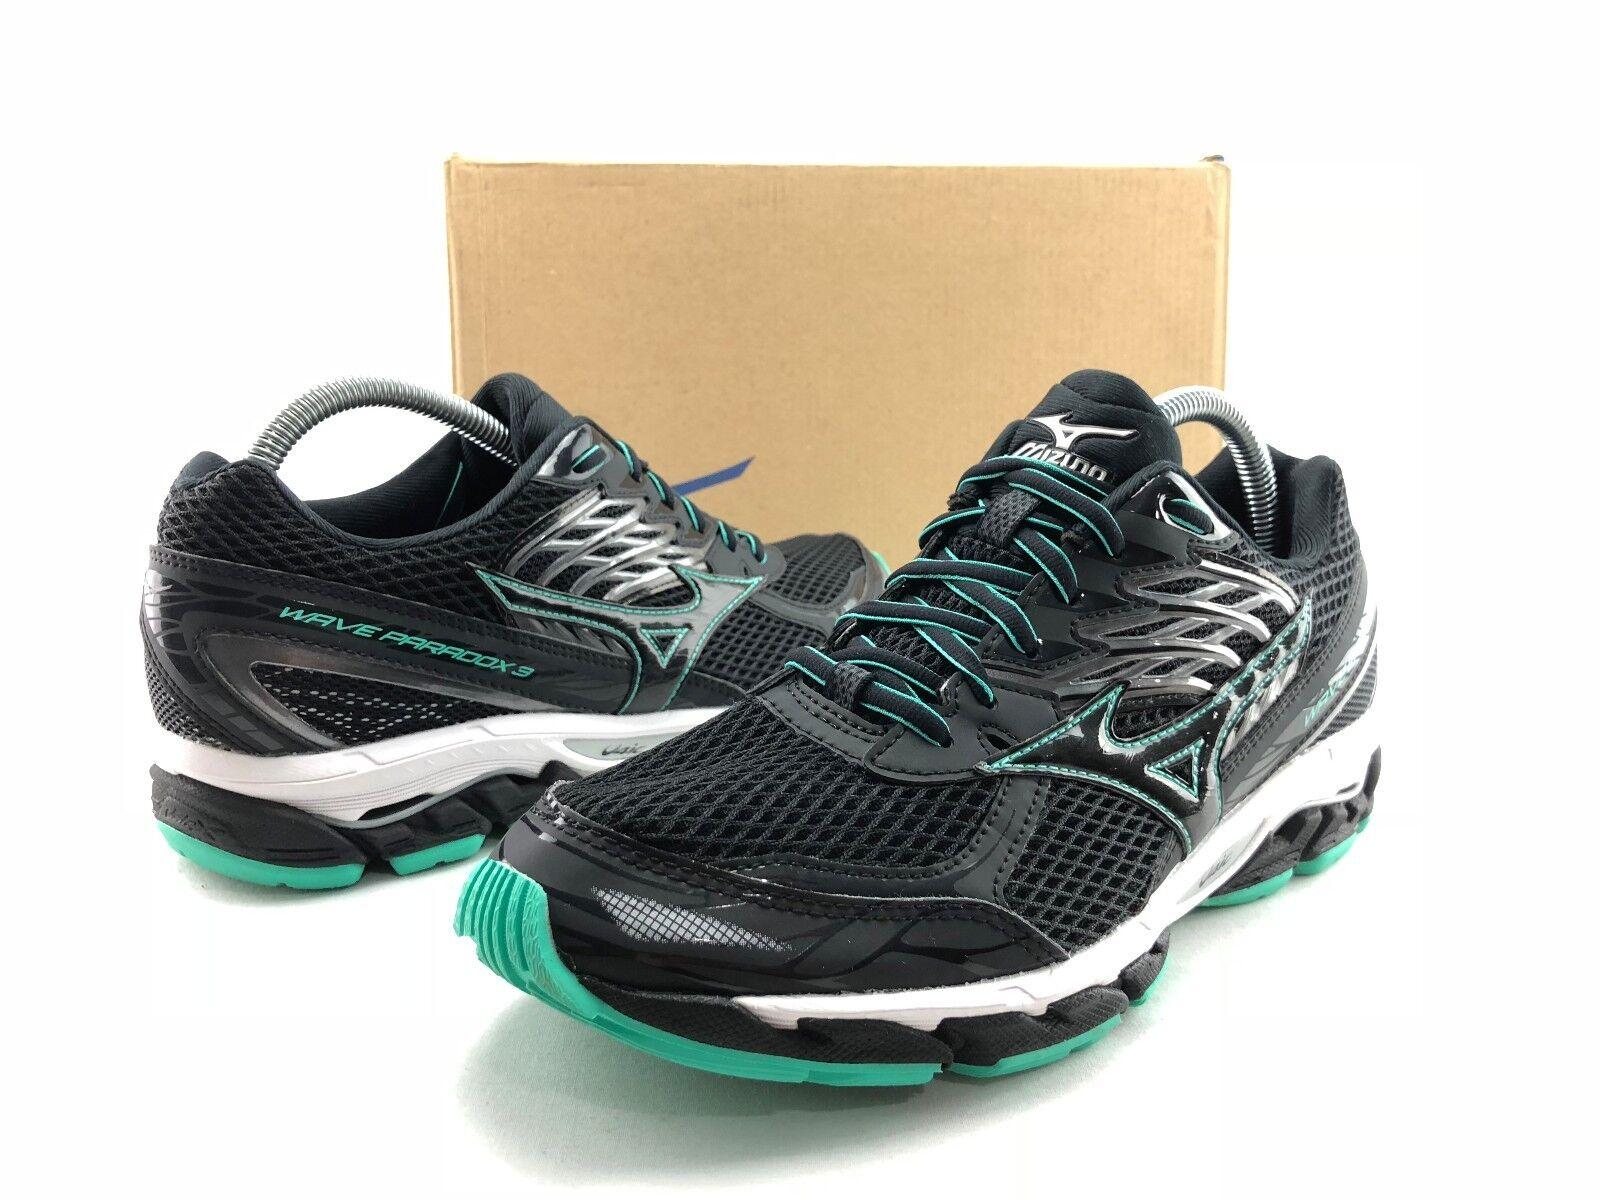 Mizuno Wave Paradox Women's Black Athletic Running Shoes US